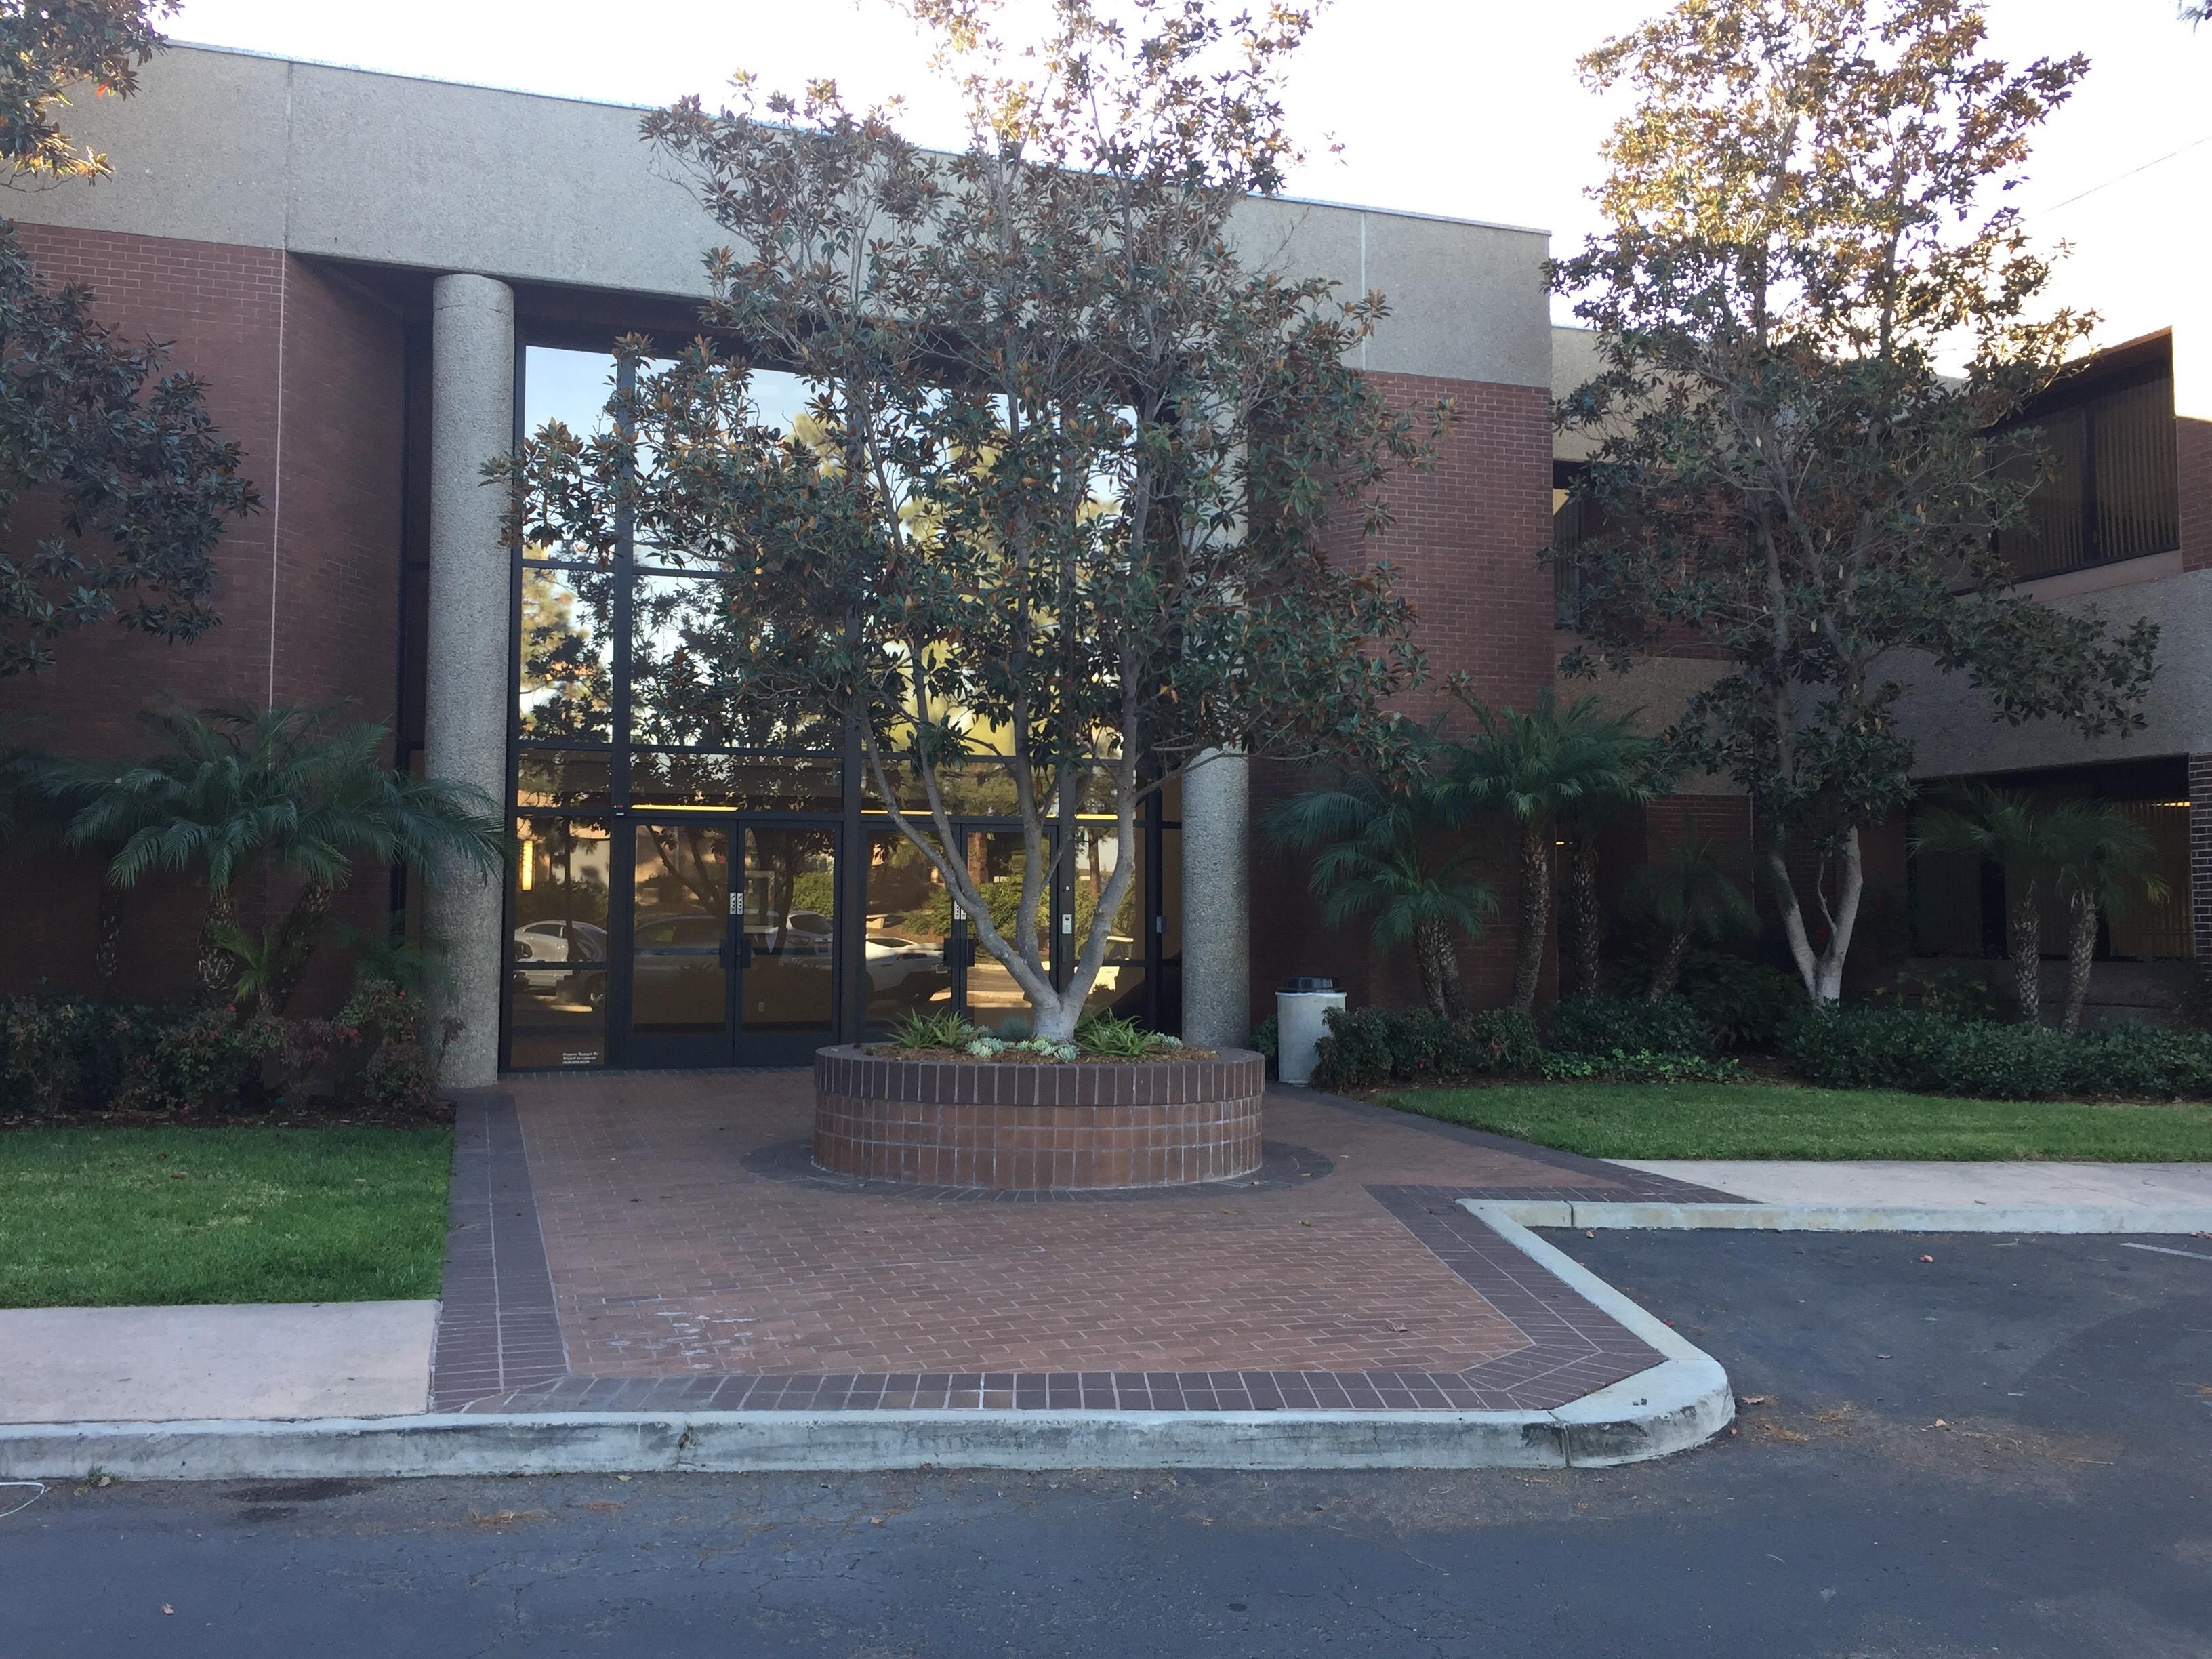 Mira Mesa San Diego sleep center - Advanced Sleep Medicine Services - entrance